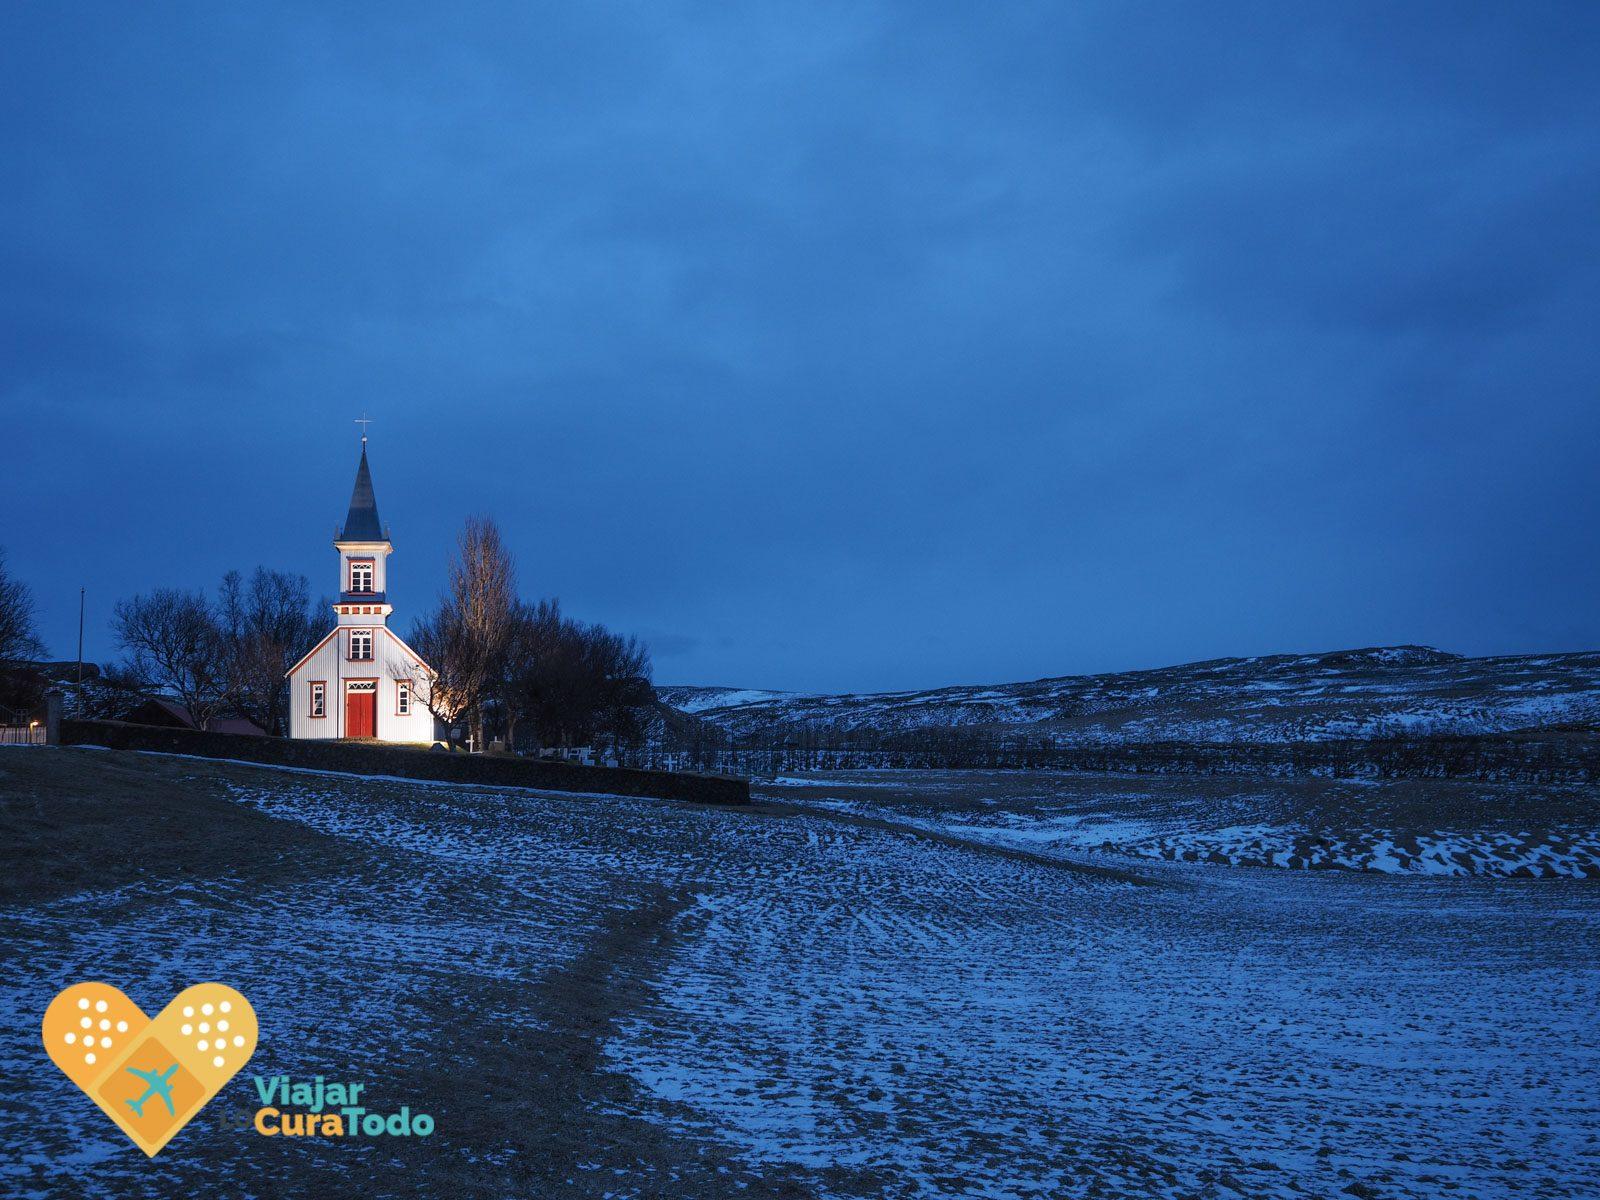 icelandic church at night